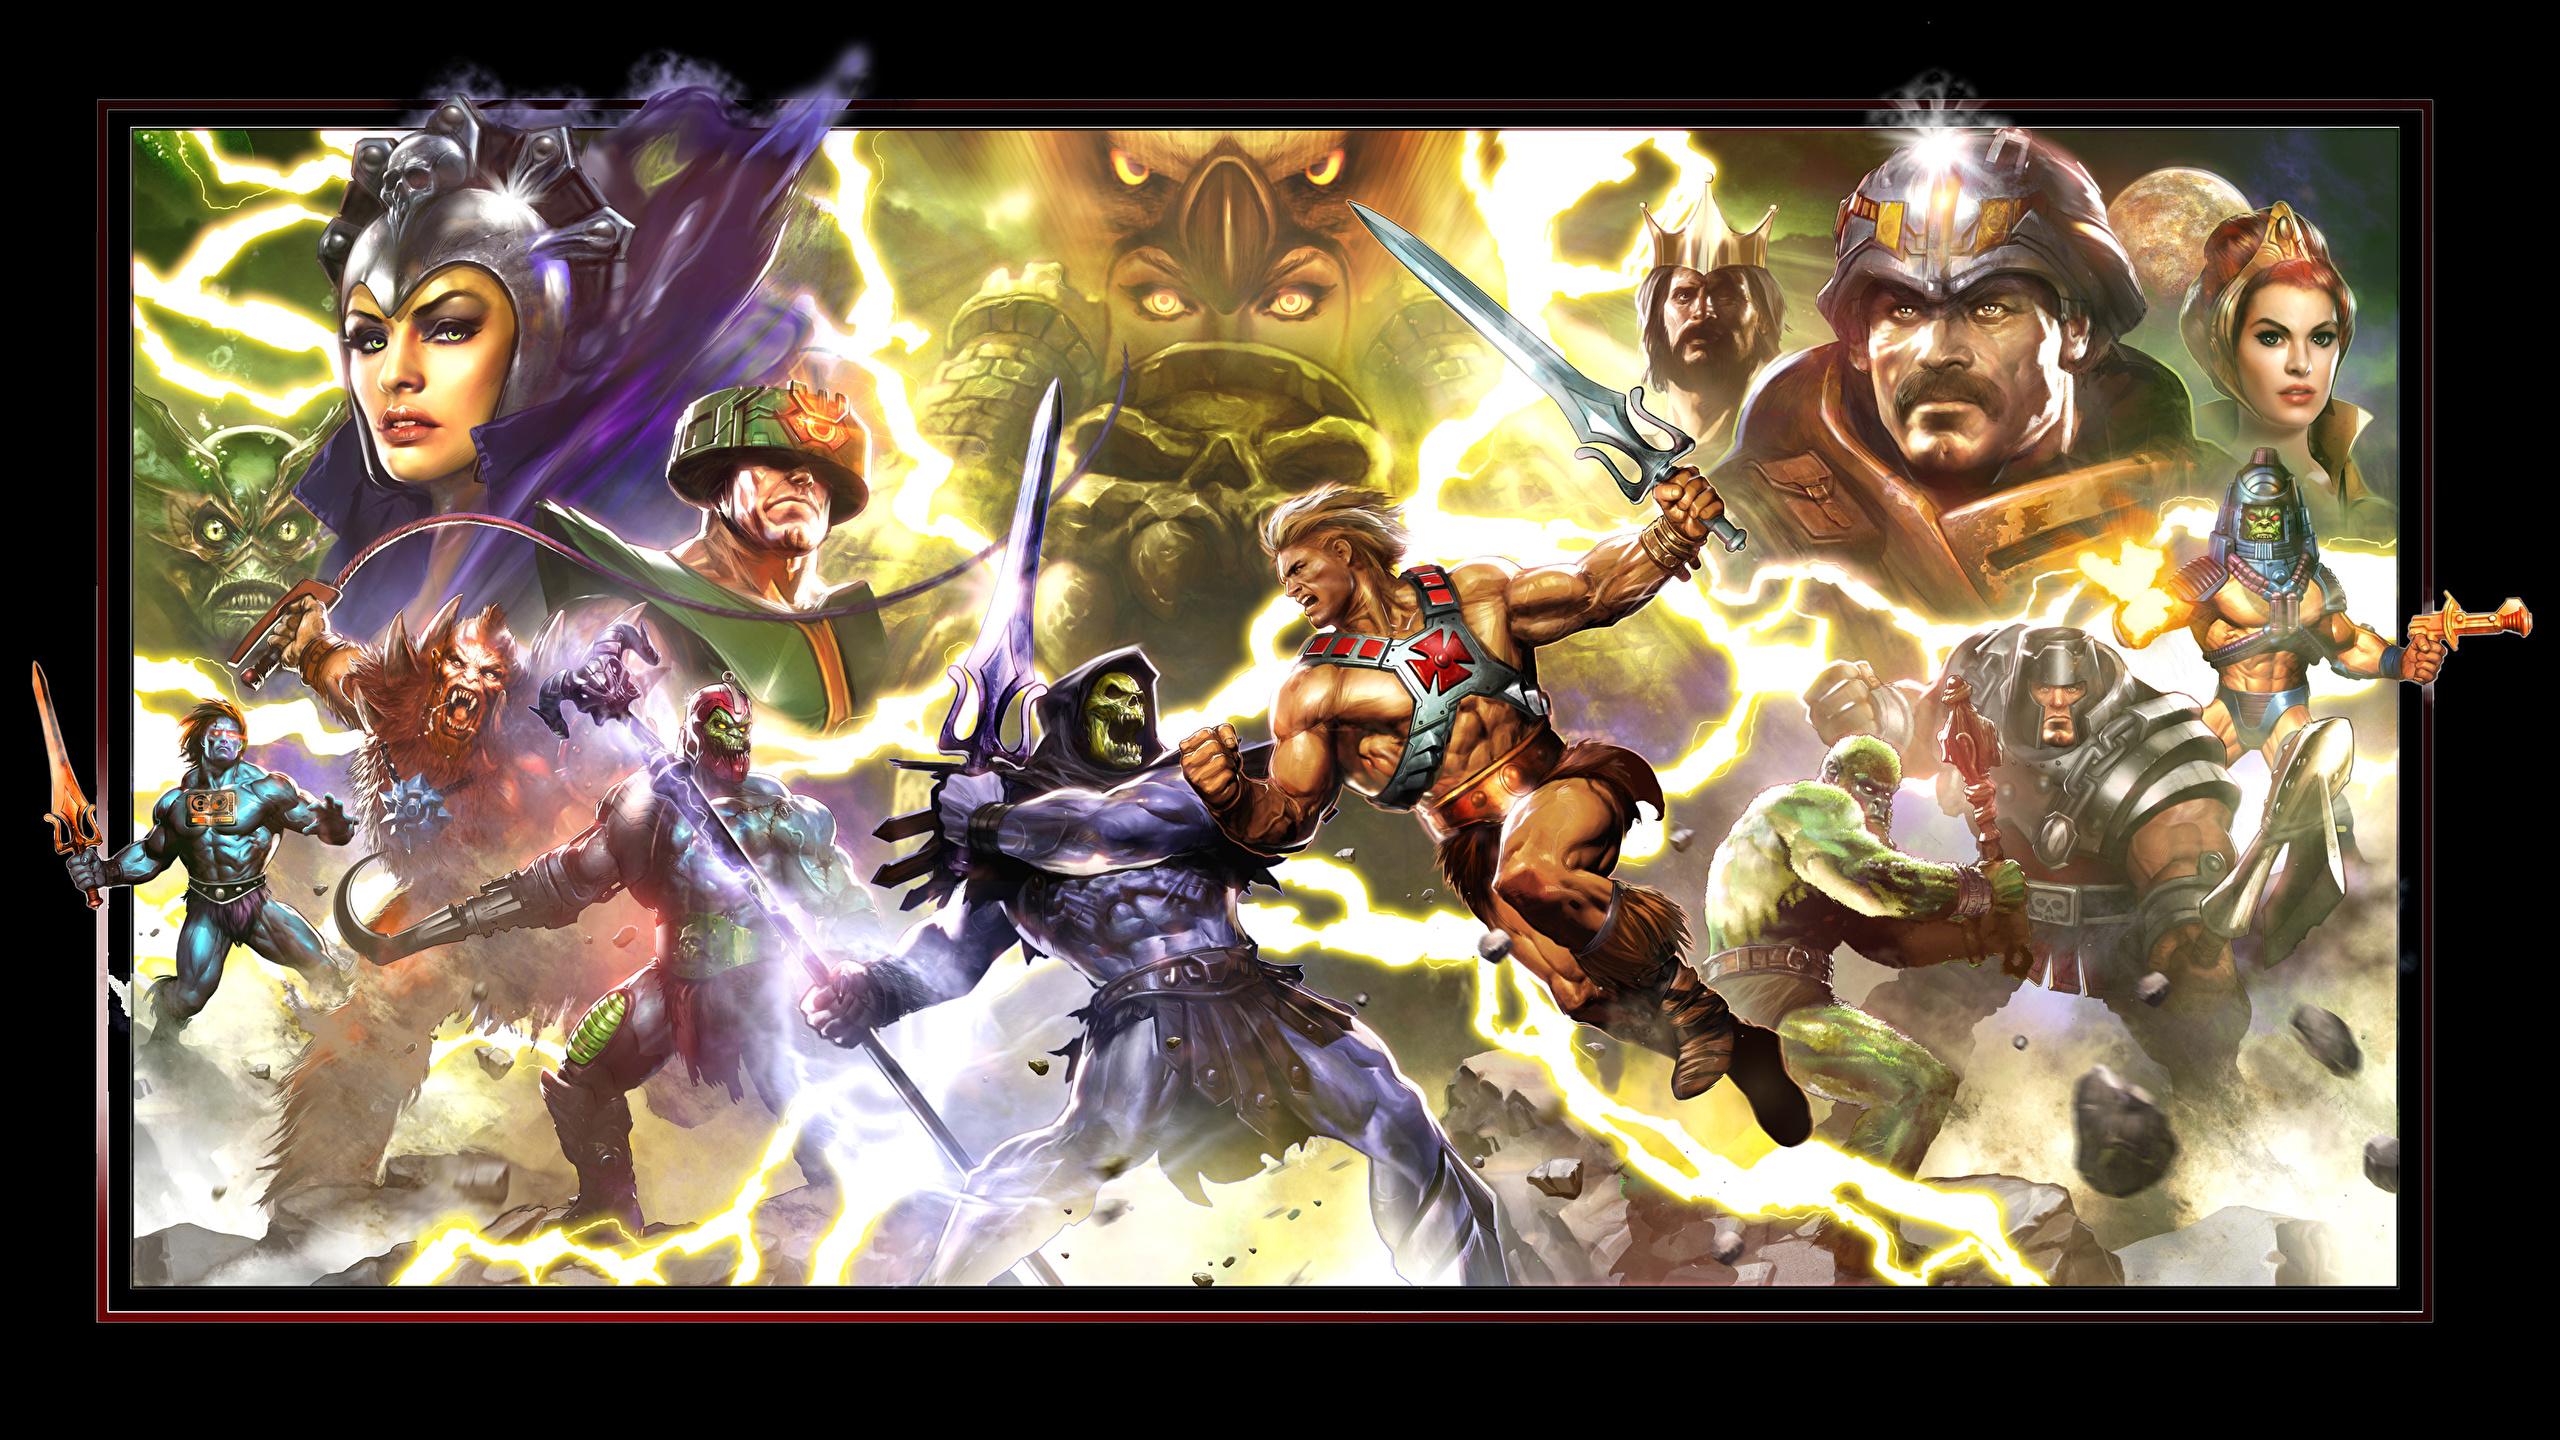 Image Swords Superheroes Monster Warrior He Man Skeletor 2560x1440